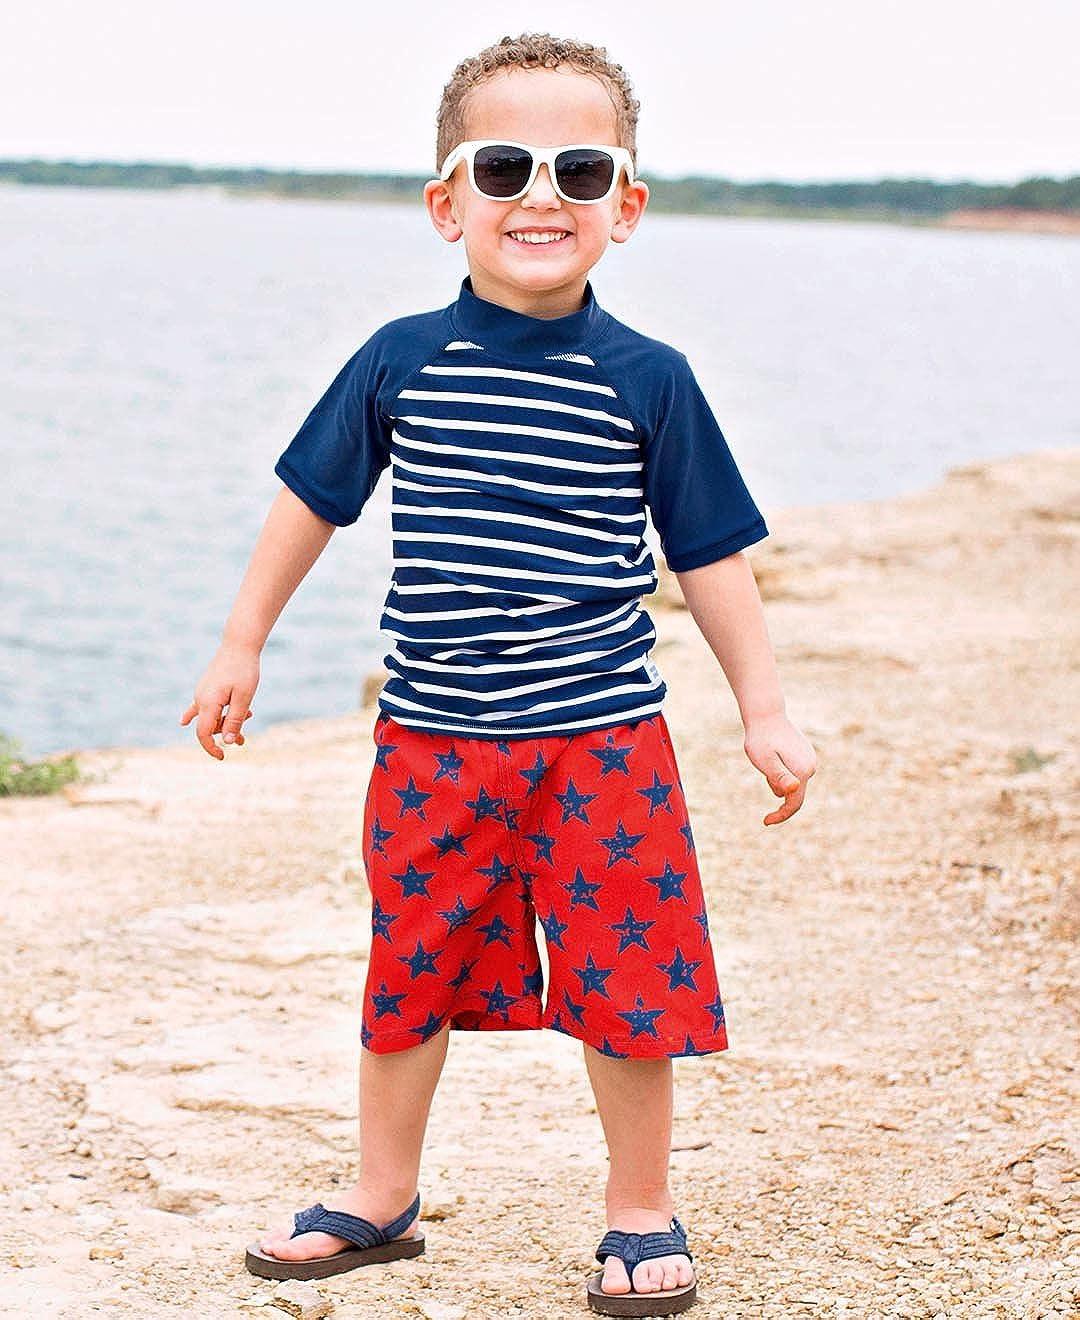 b0f9e3fc21272 Boys RuggedButts Baby/Toddler Boys Swim Trunks w/Adjustable Waistband  BWSRD06-NVSR